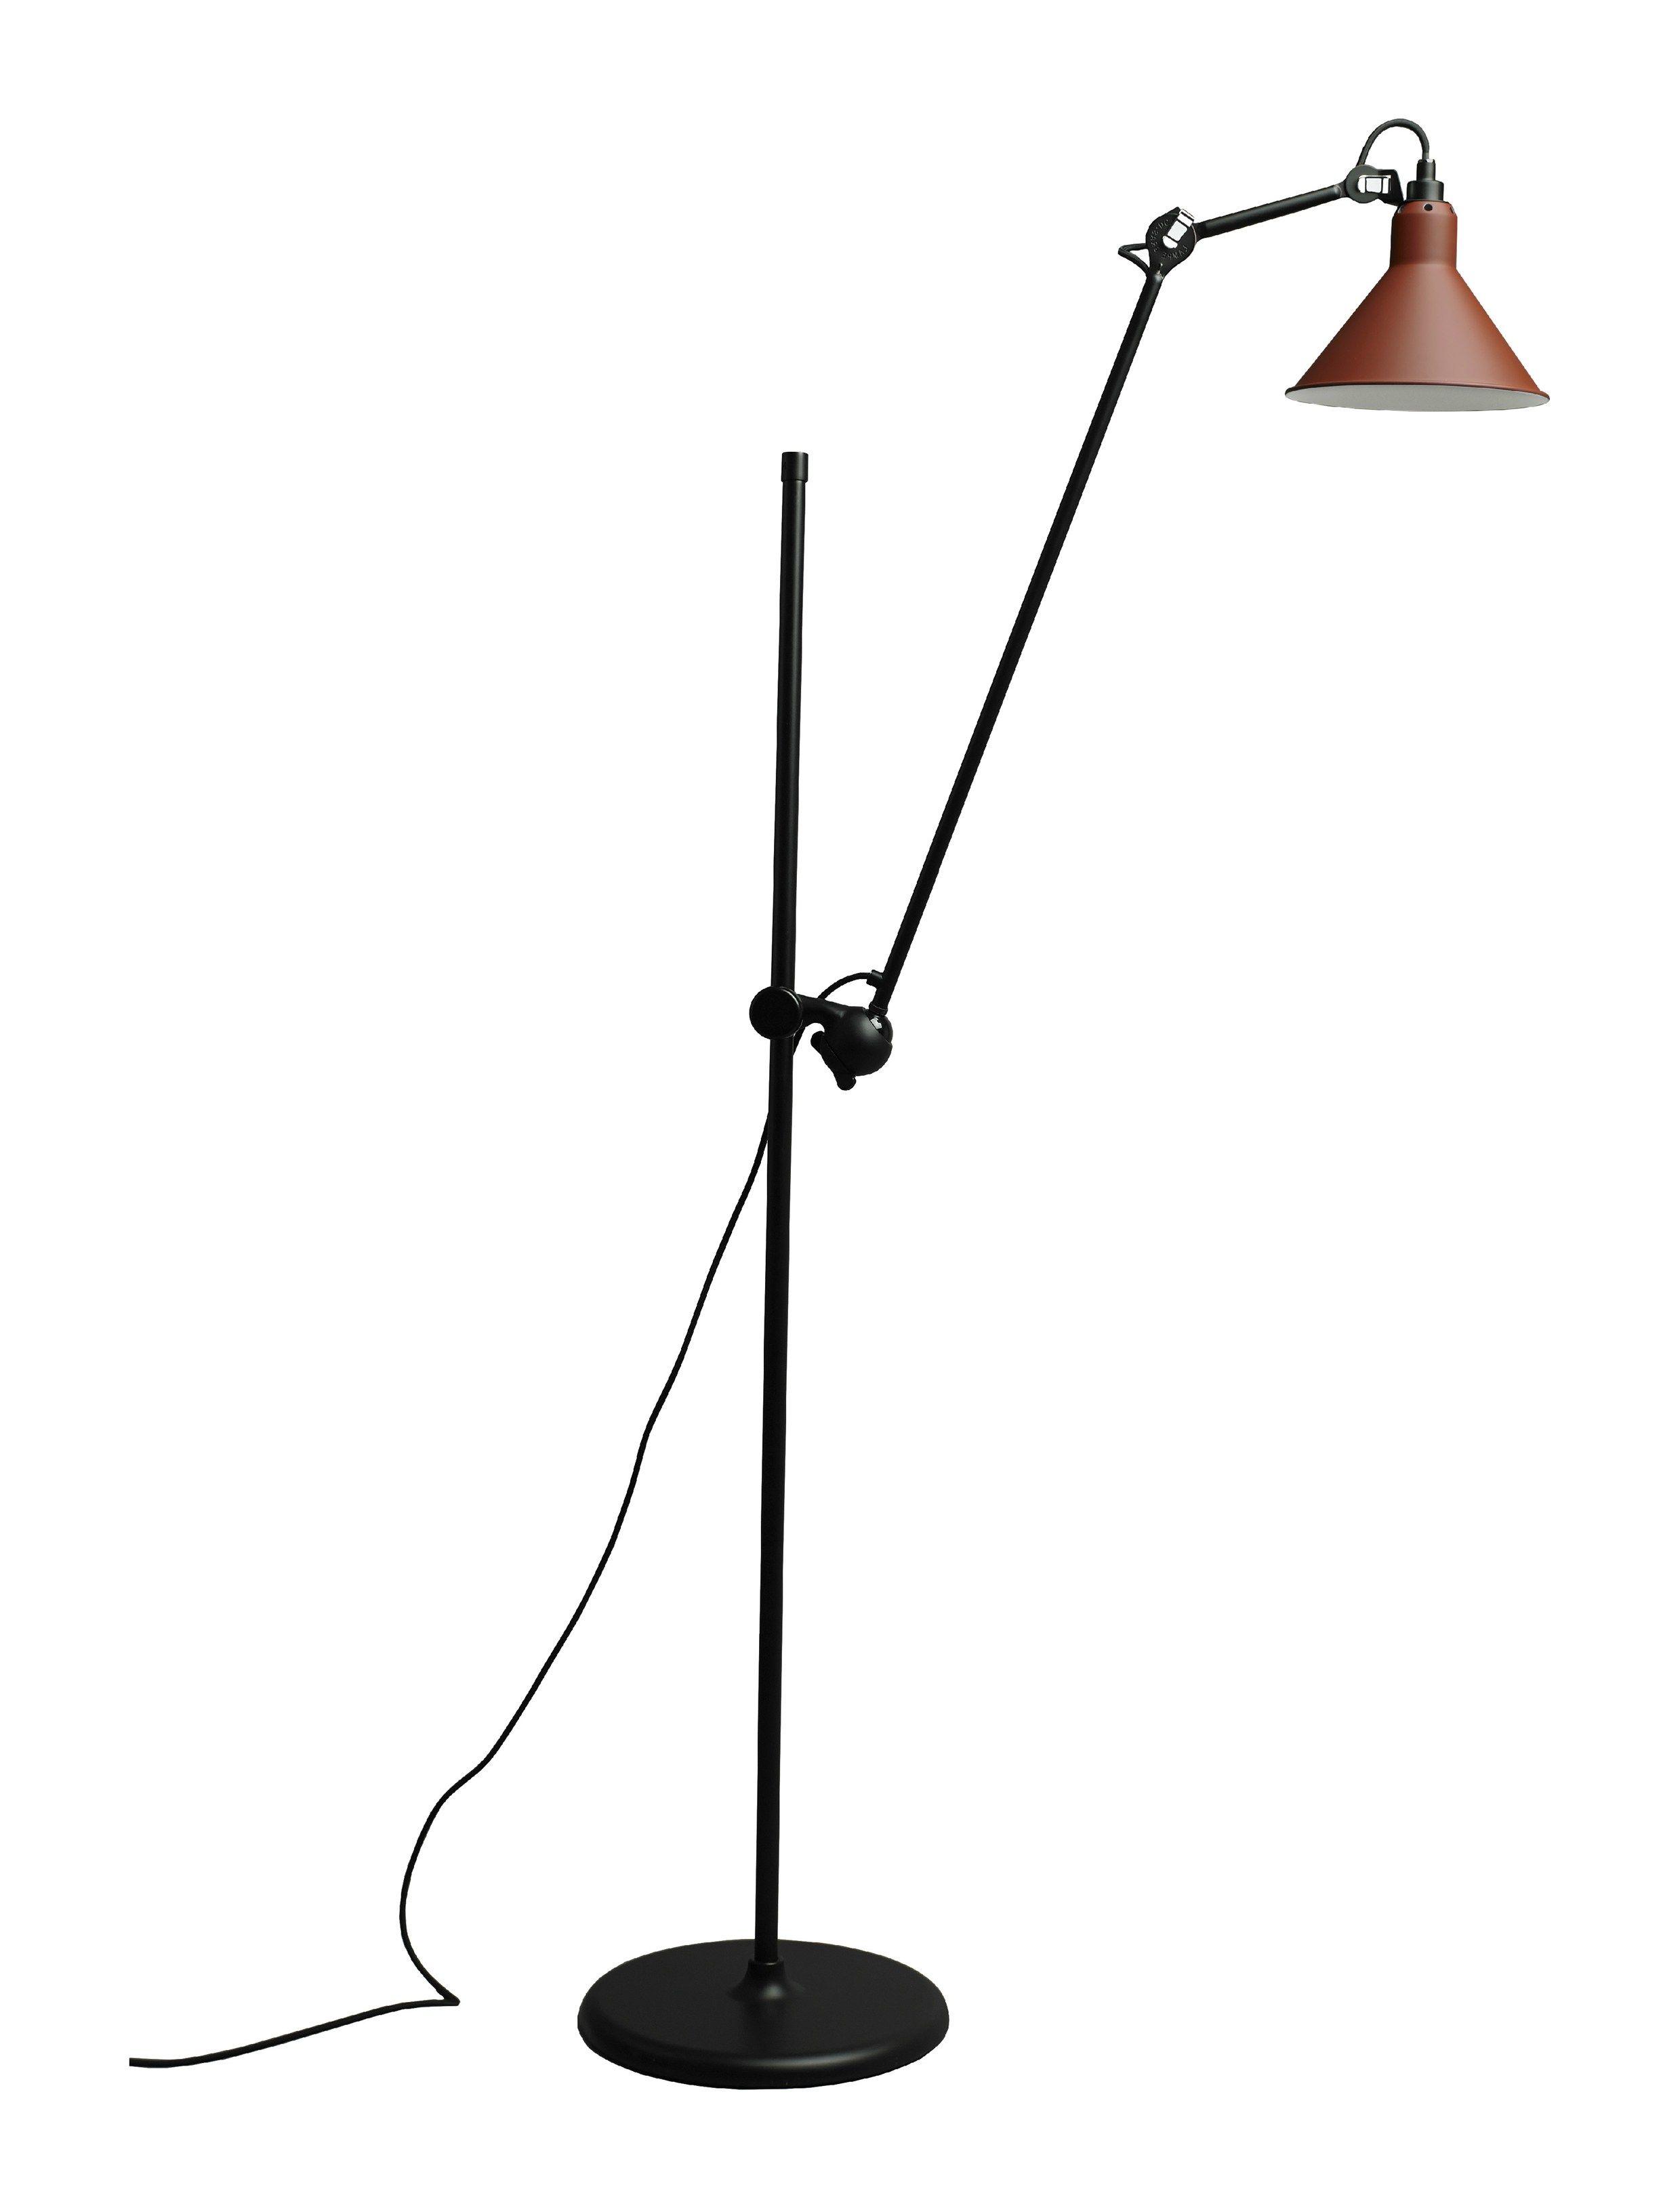 Floor Lamp With Swing Arm Swing Arm Floor Lamp Brass